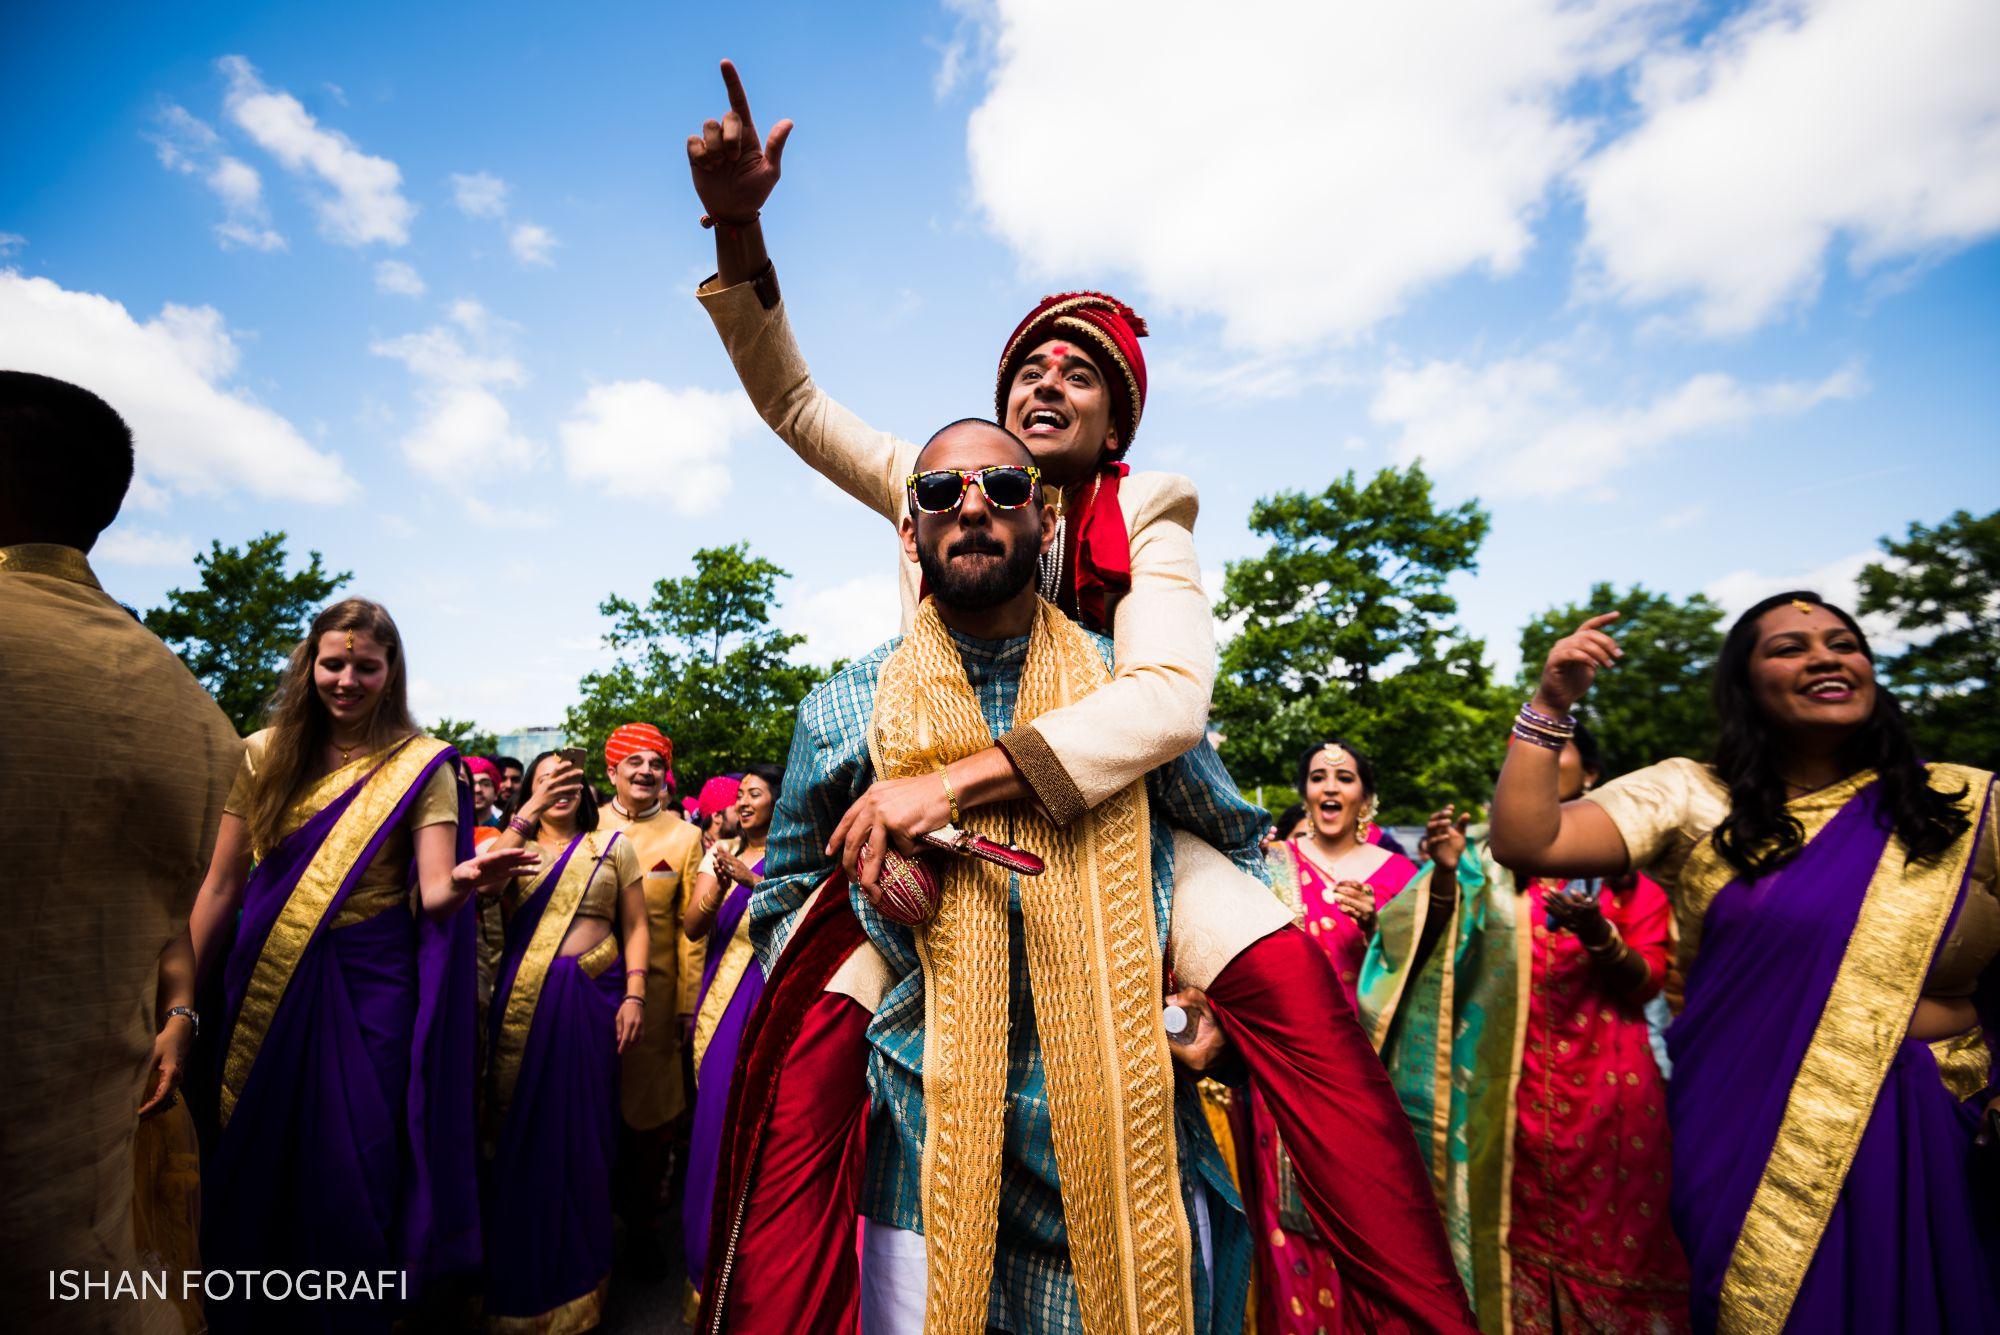 indian-wedding-baraat-sheraton-parsippany